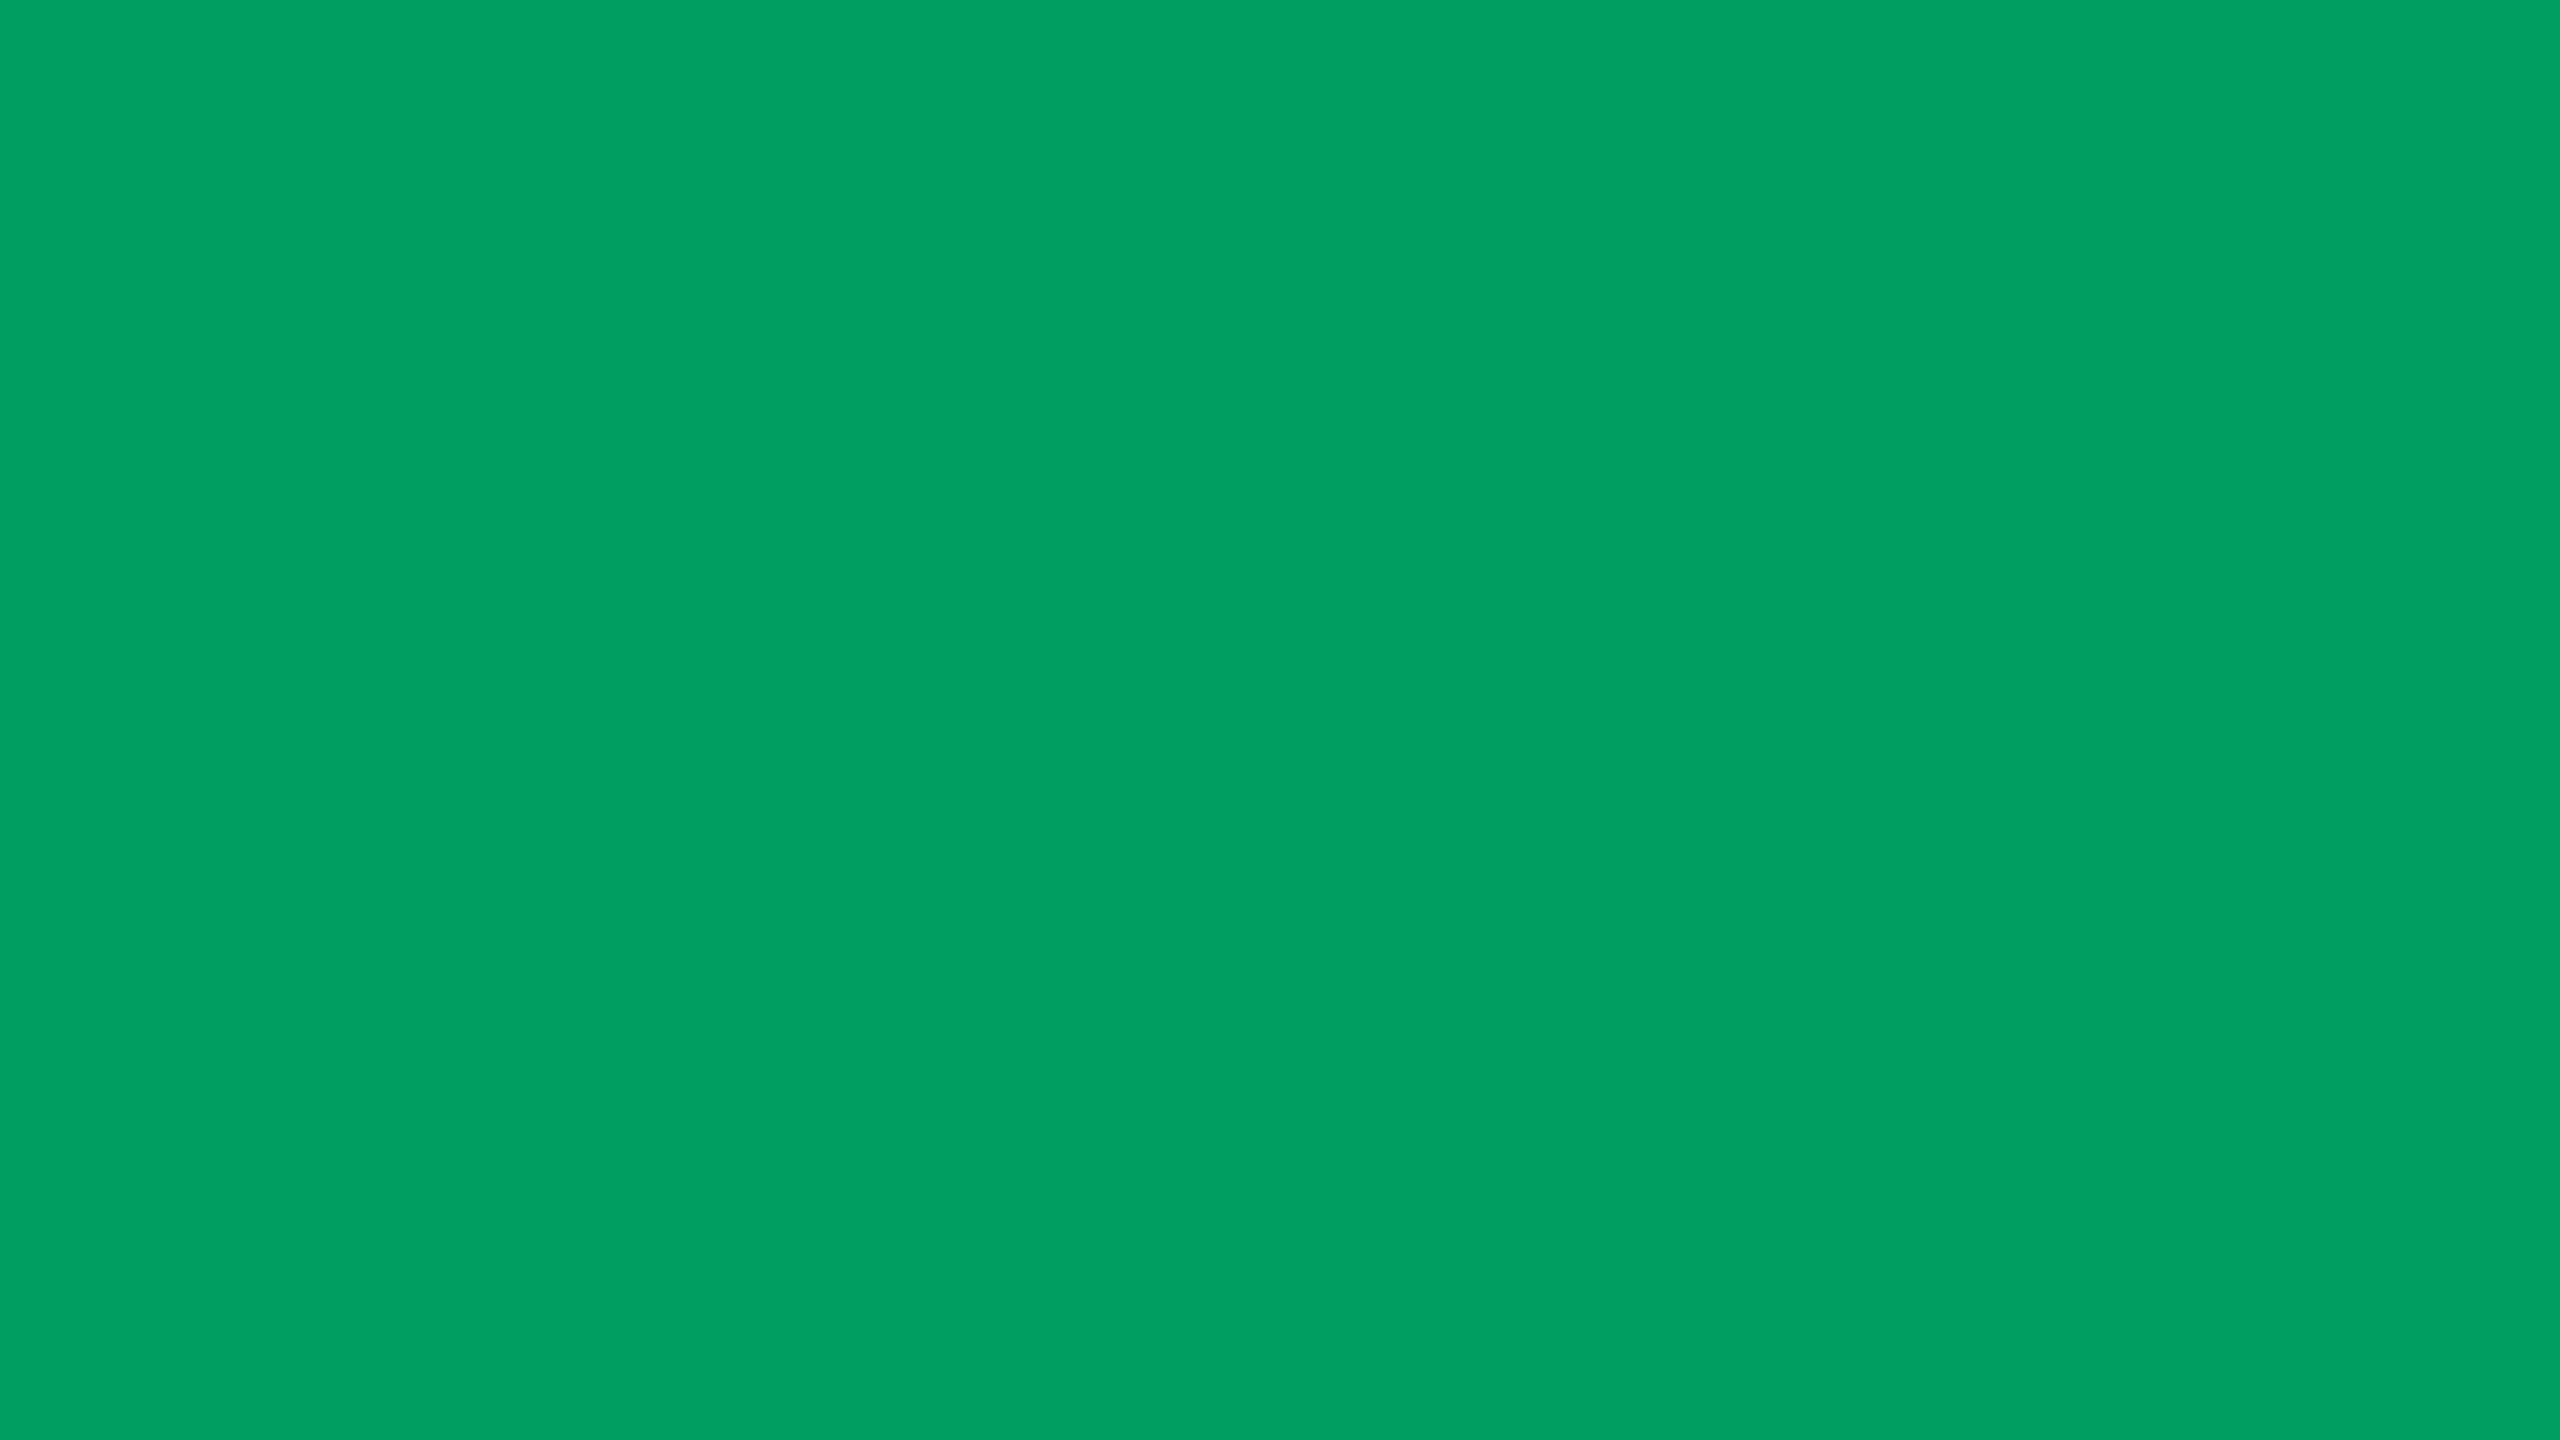 2560x1440 Shamrock Green Solid Color Background